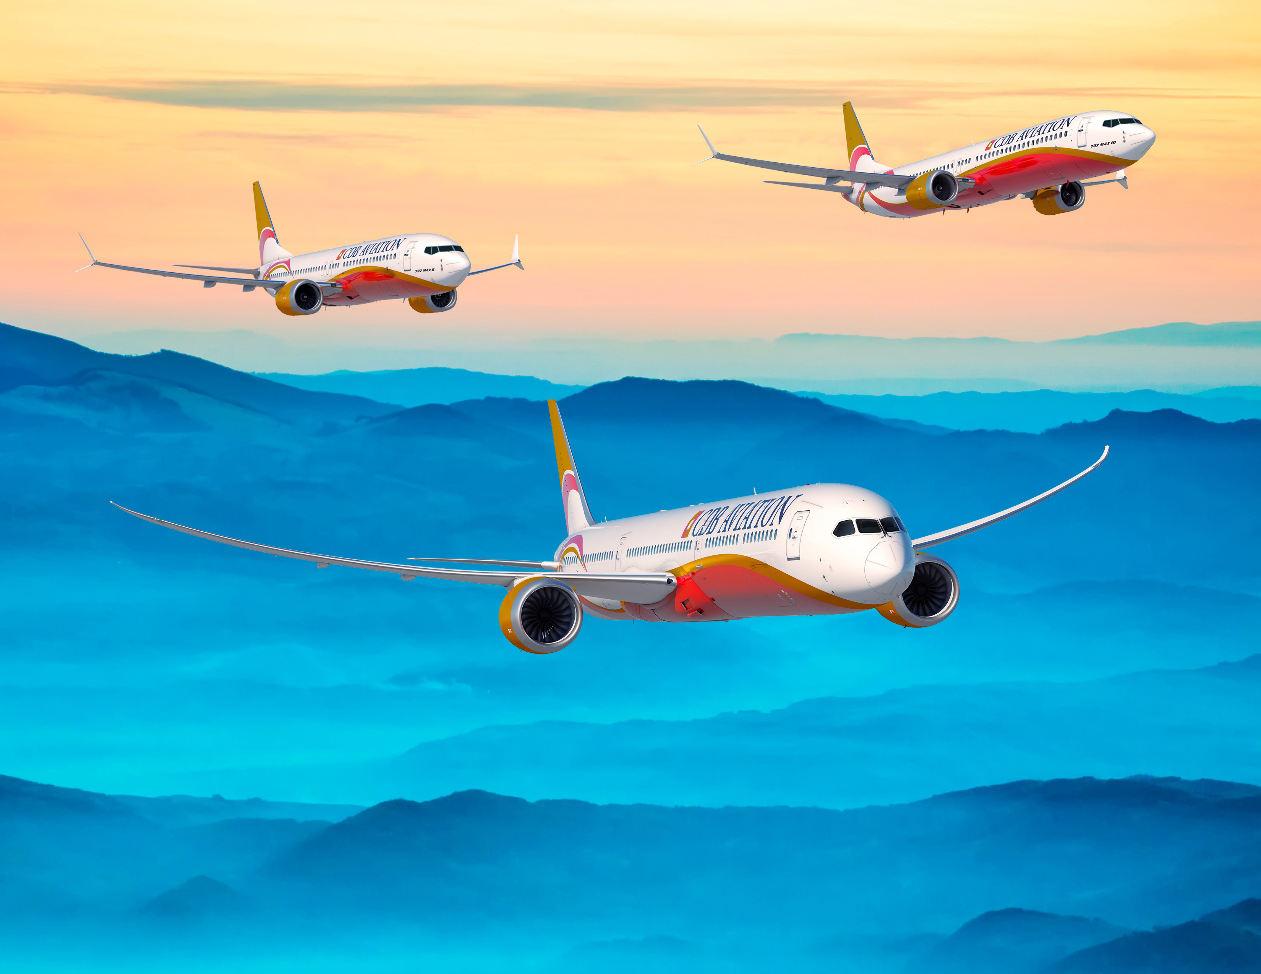 Paris 2017: Boeing, CDB Aviation Lease Finance sign $7.4bn MoU